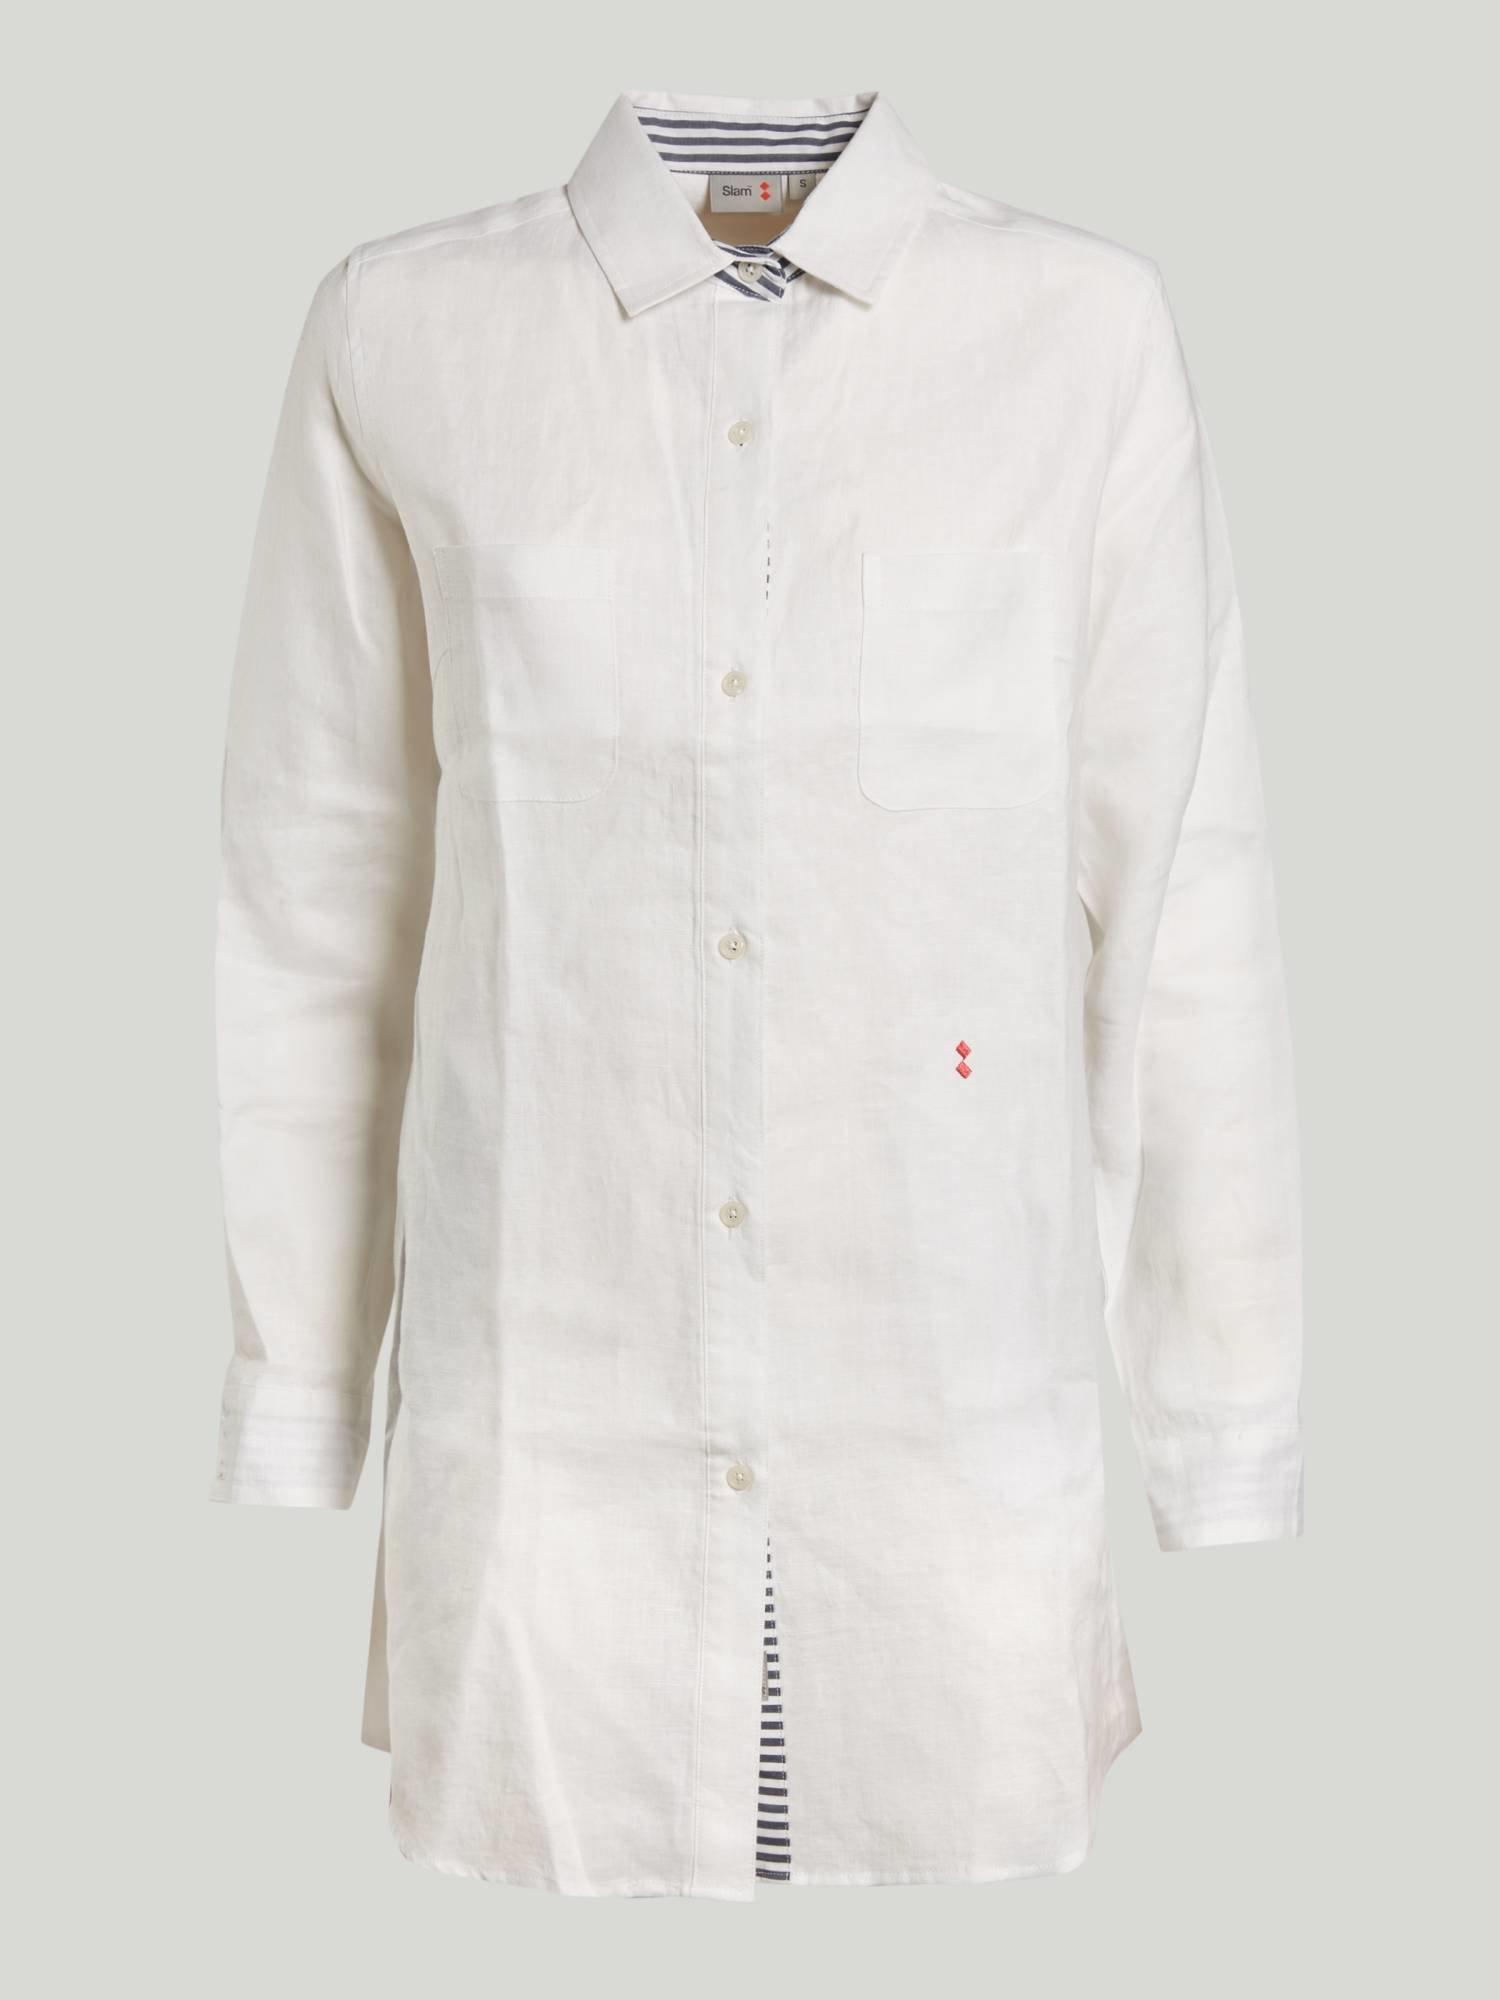 DRESS A168 - Blanco